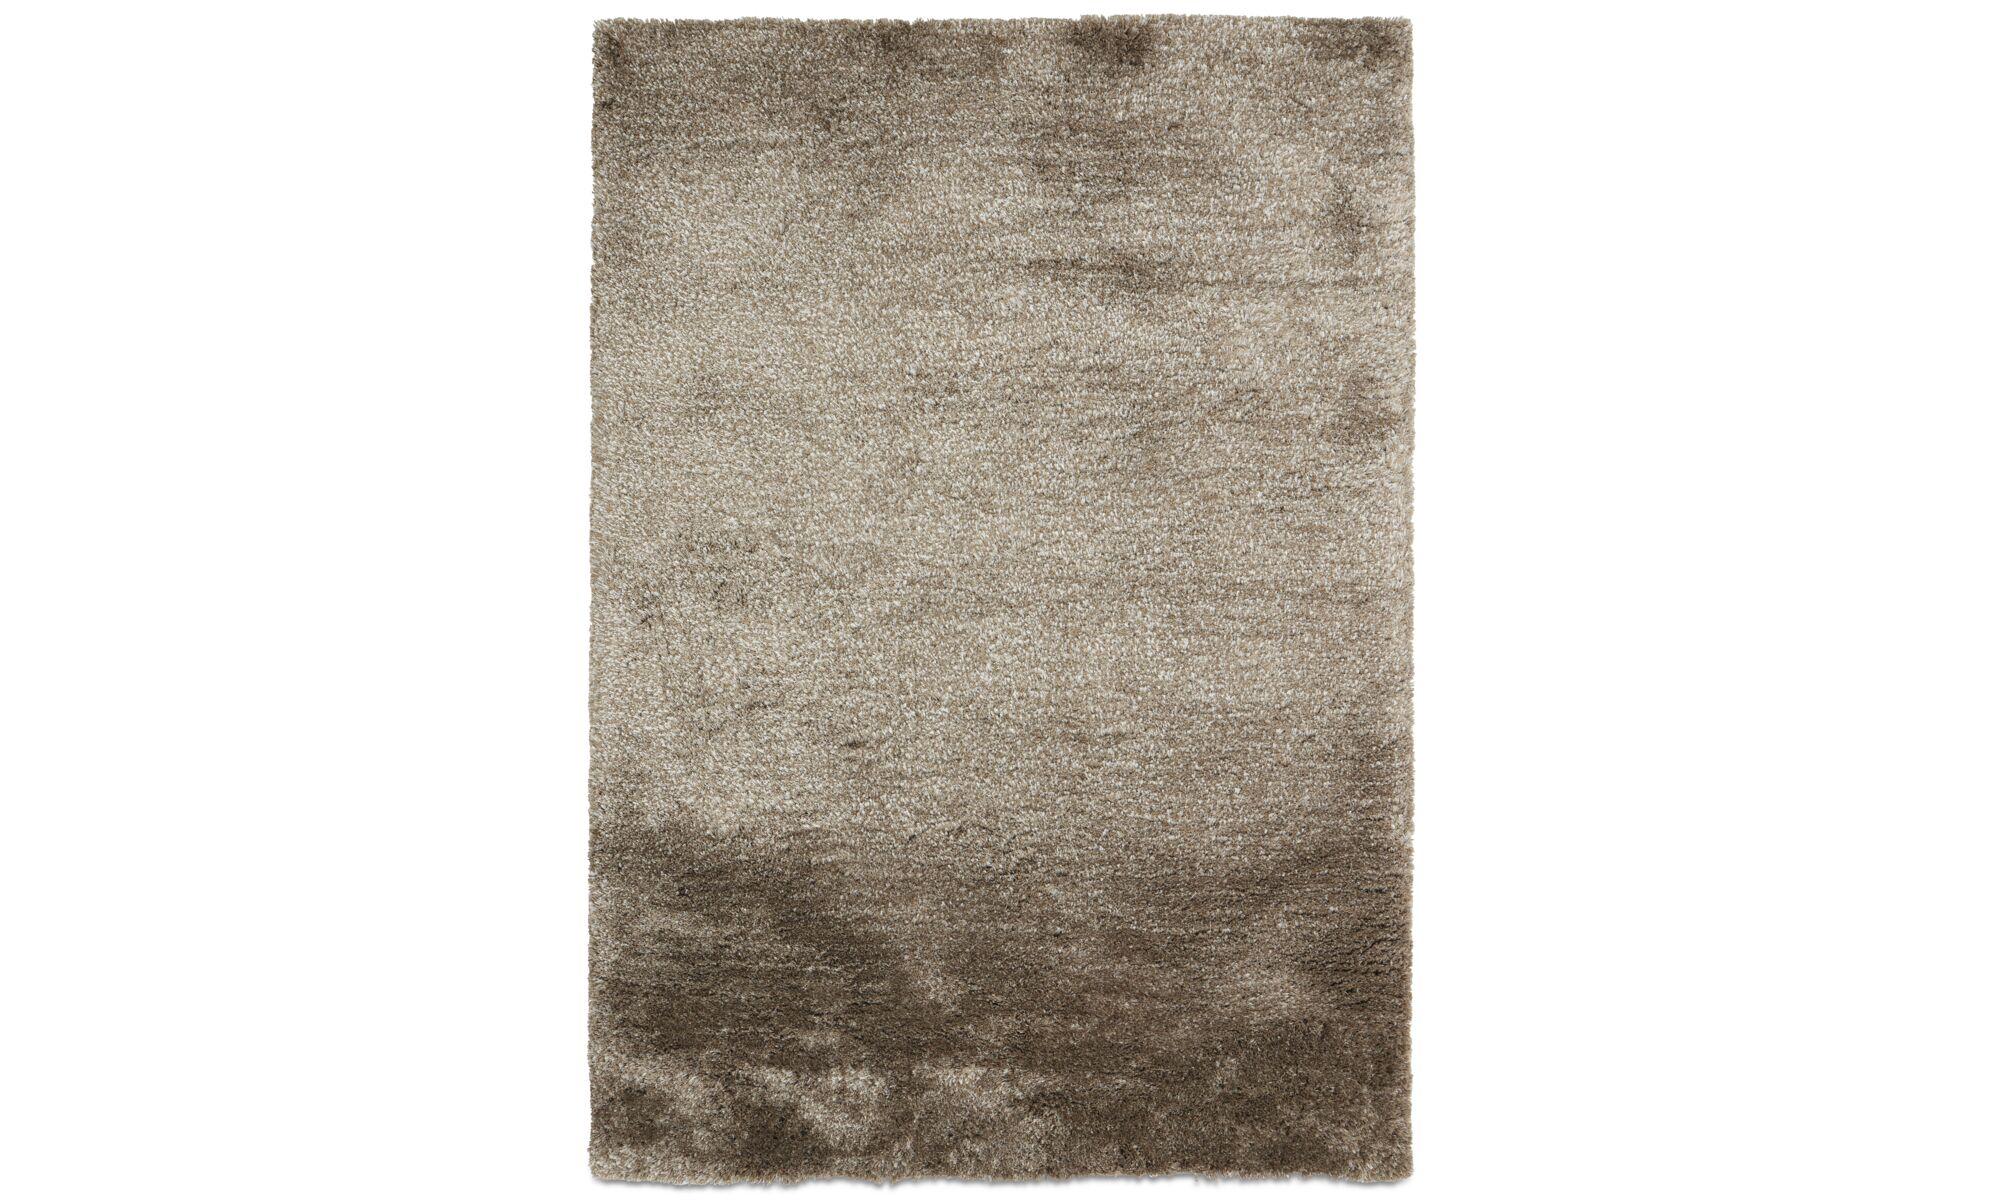 Rugs - Movement rug - rectangular - Grey - Polyester